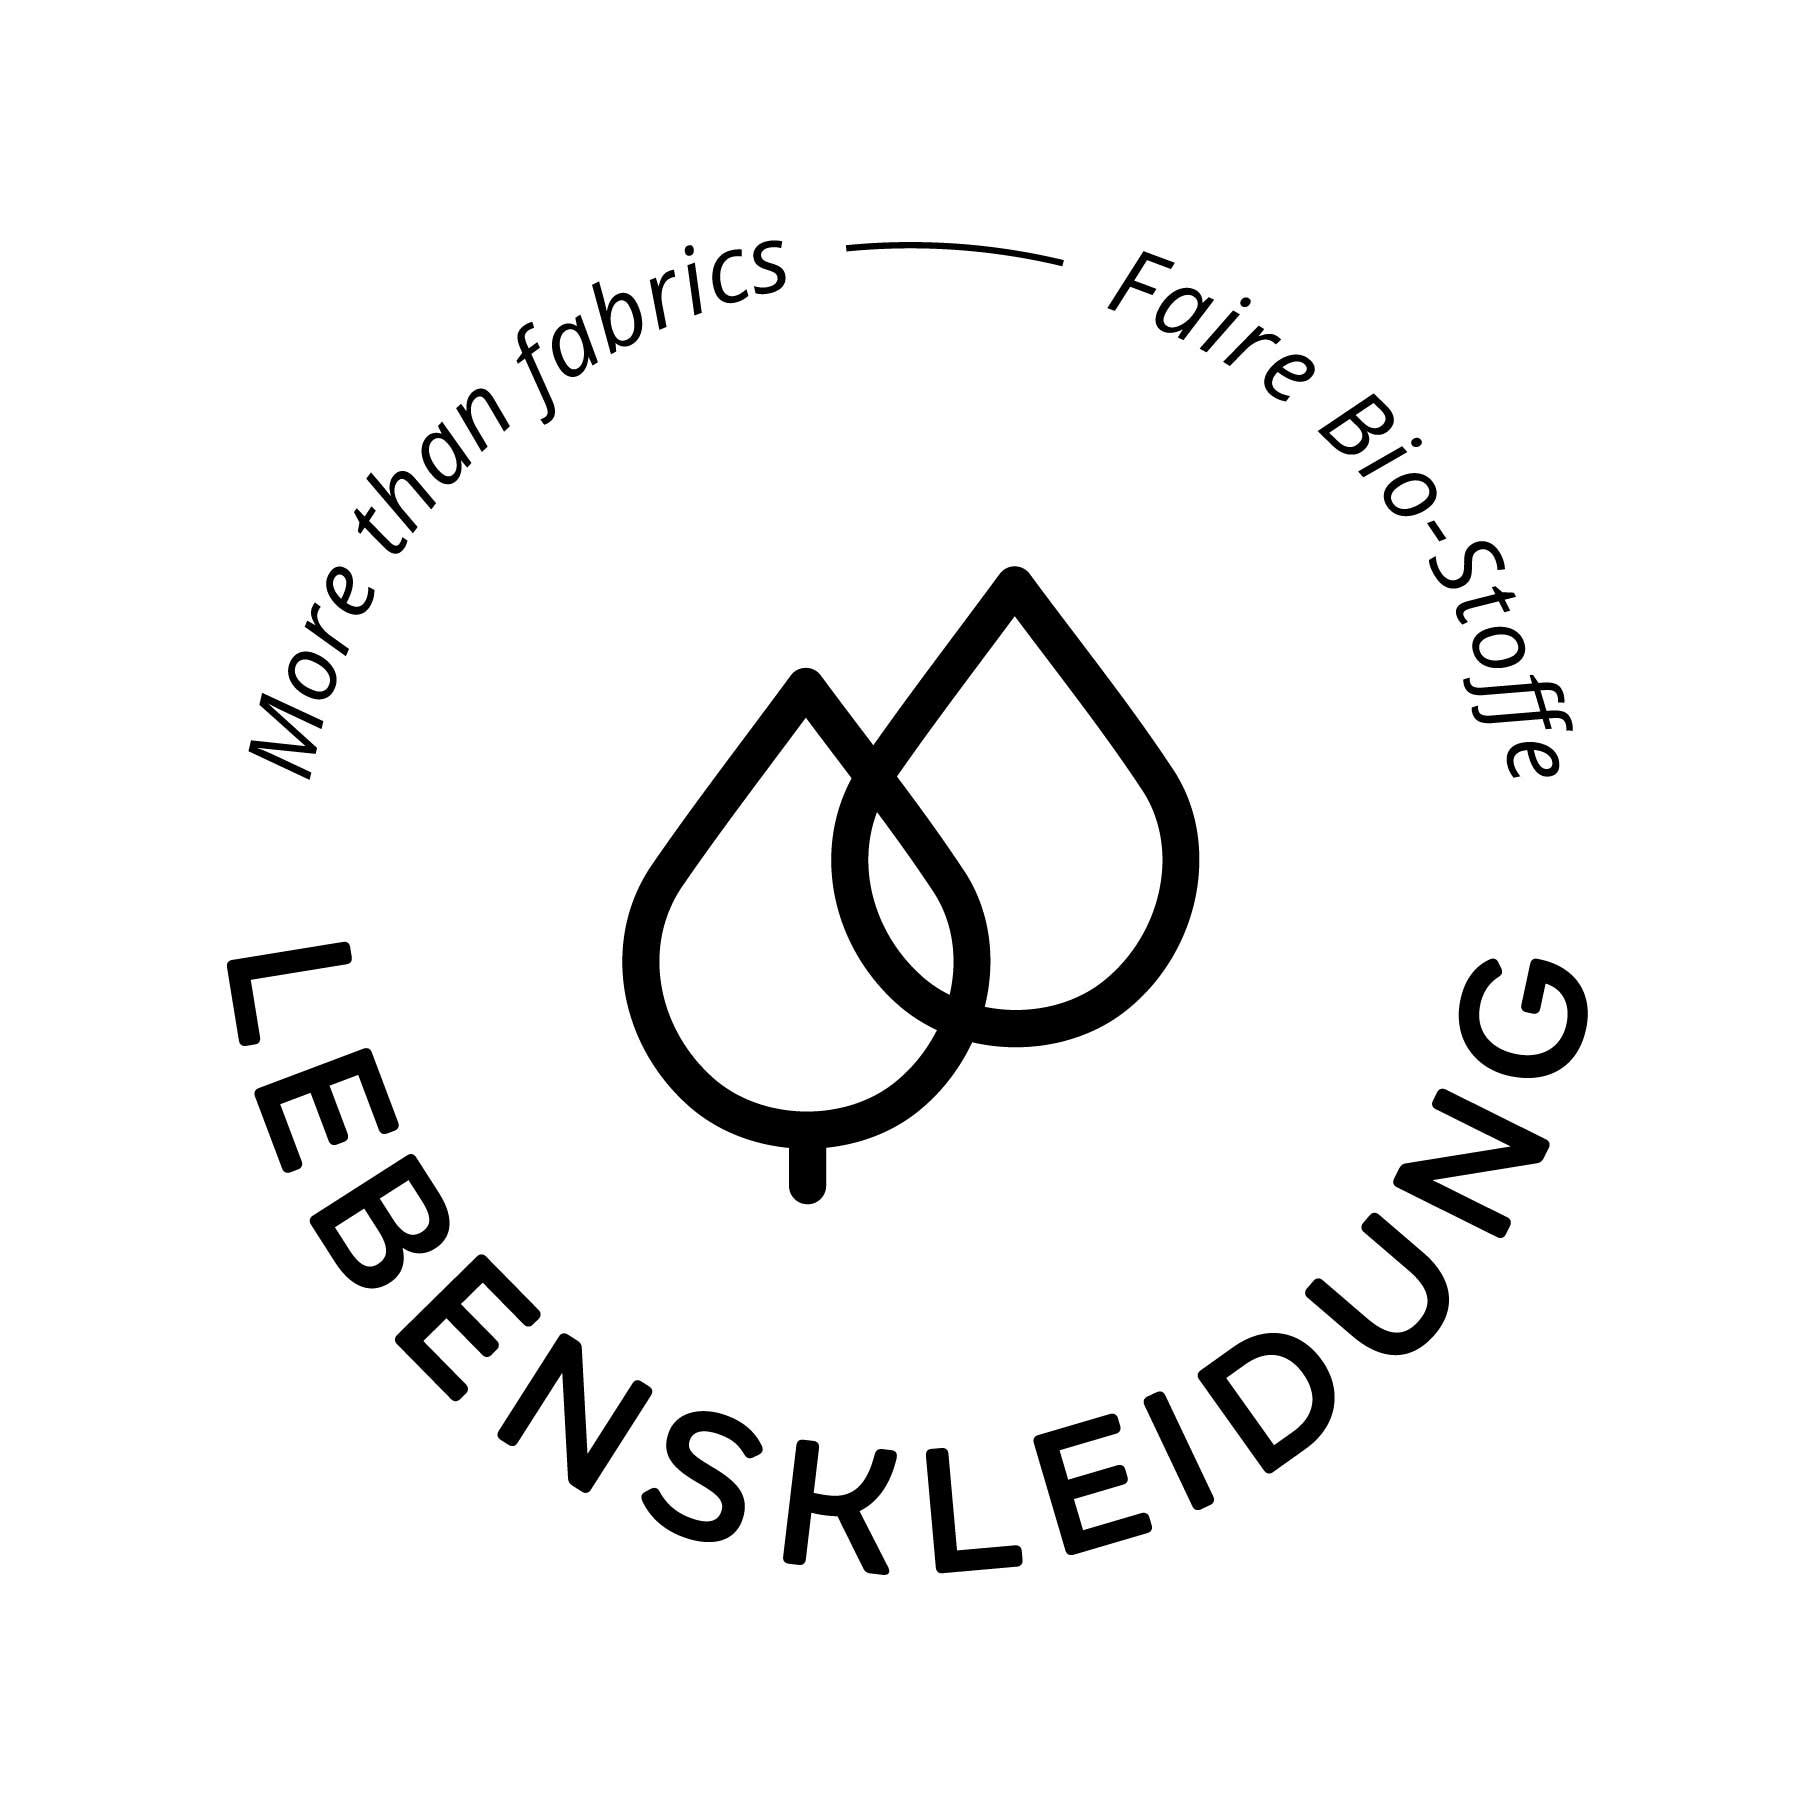 Bio Puños Tela - Gris canoso - OscuroGrigio